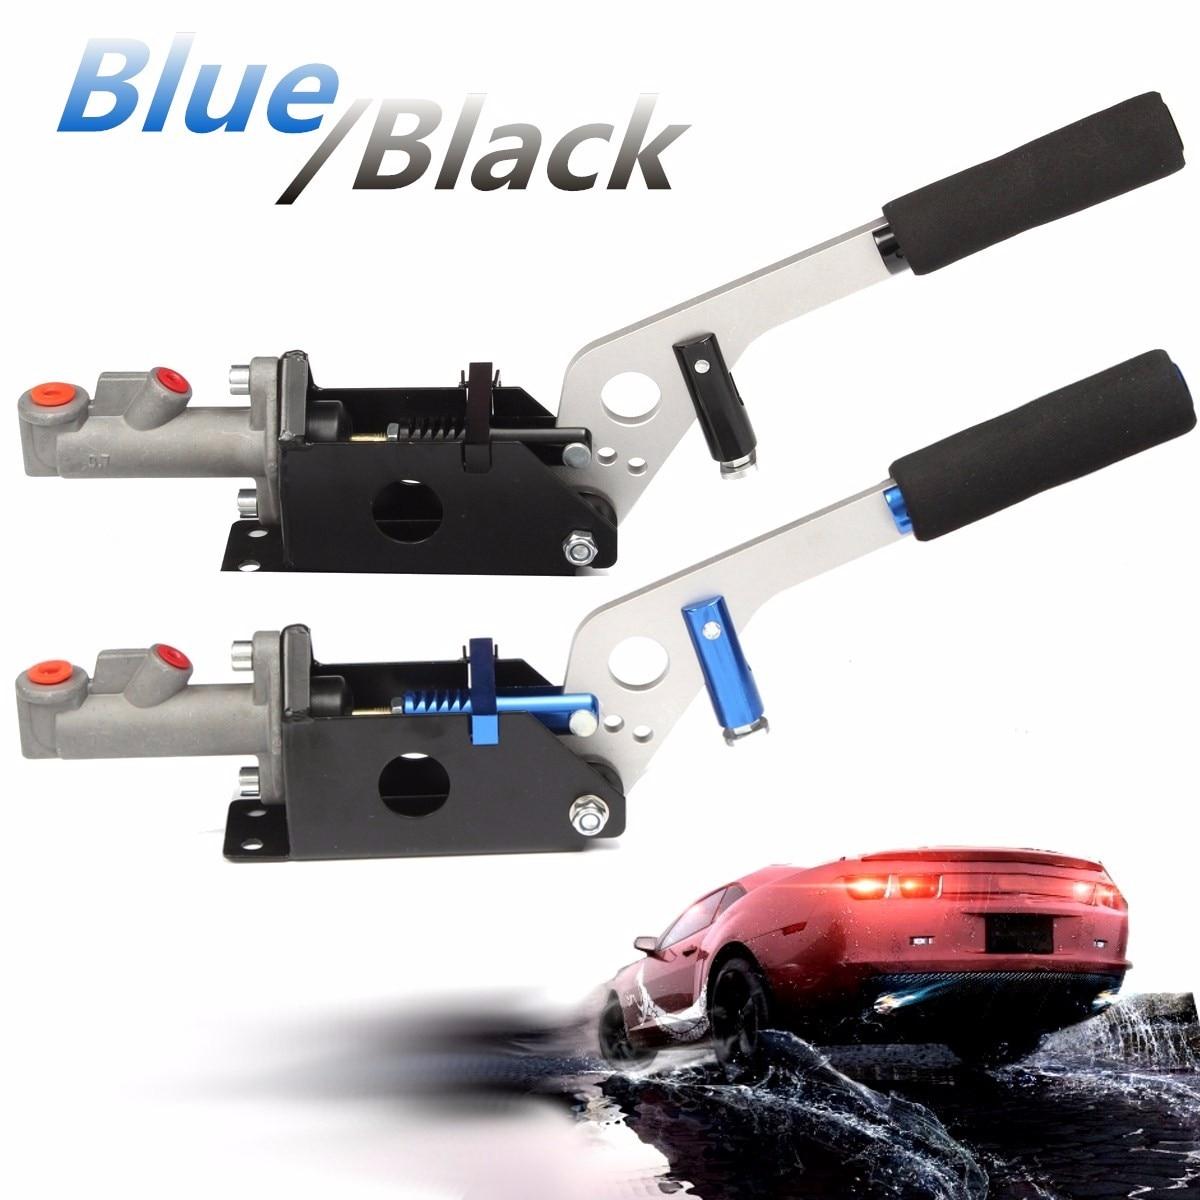 Car Accessories Universal Hydraulic Horizontal Racing Drift Handbrake Hand E Brake Parking Brake LeverCar Accessories Universal Hydraulic Horizontal Racing Drift Handbrake Hand E Brake Parking Brake Lever